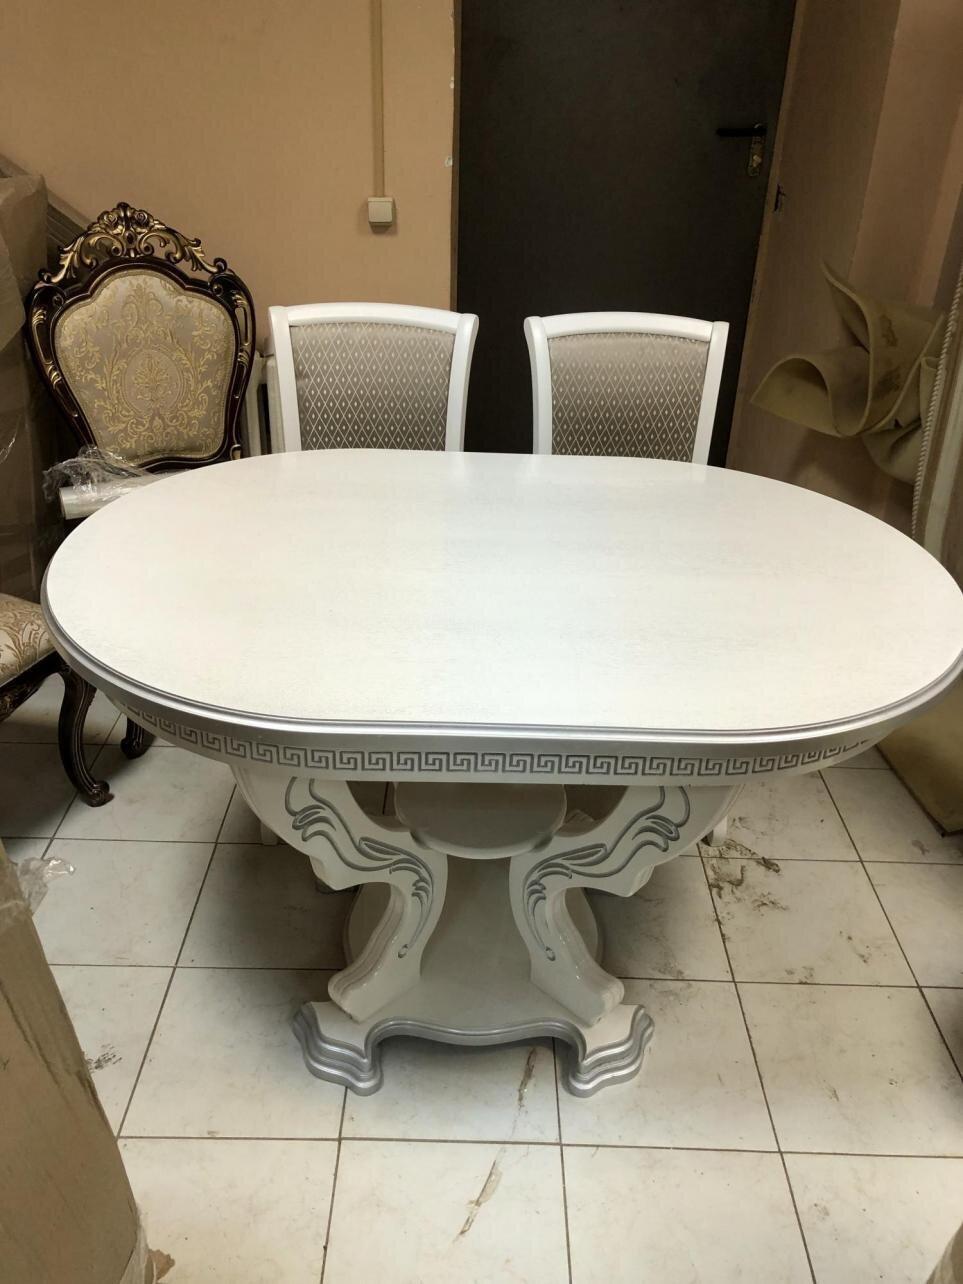 Комплект обеденный Стол 130 на 90 + 2 стула - фото pic_e5ba791e55bdd00a9da6c500adcb570d_1920x9000_1.jpg